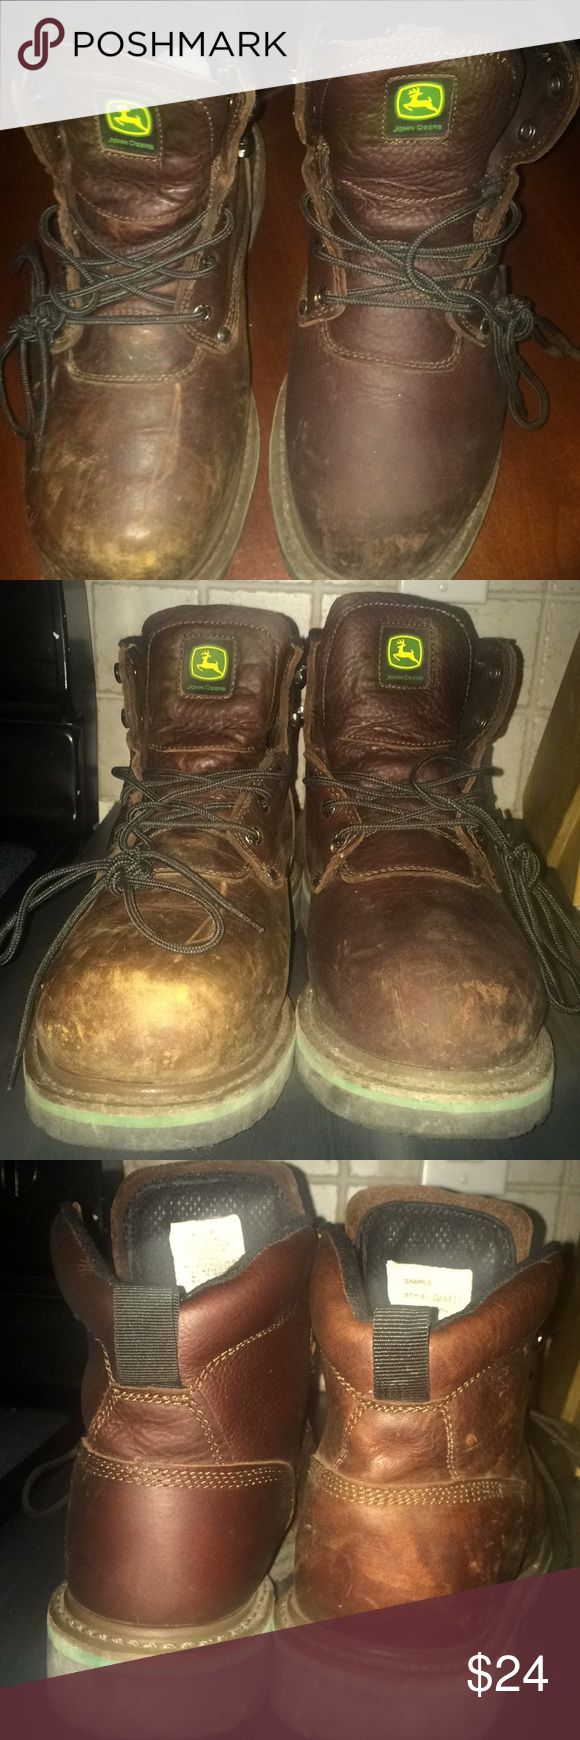 John Deere boots. Sz 9 John Deere boots. Sz 9. Style JD6373. Heat resistant soles. Composite Metatarsal toe box. John Deere Shoes Boots